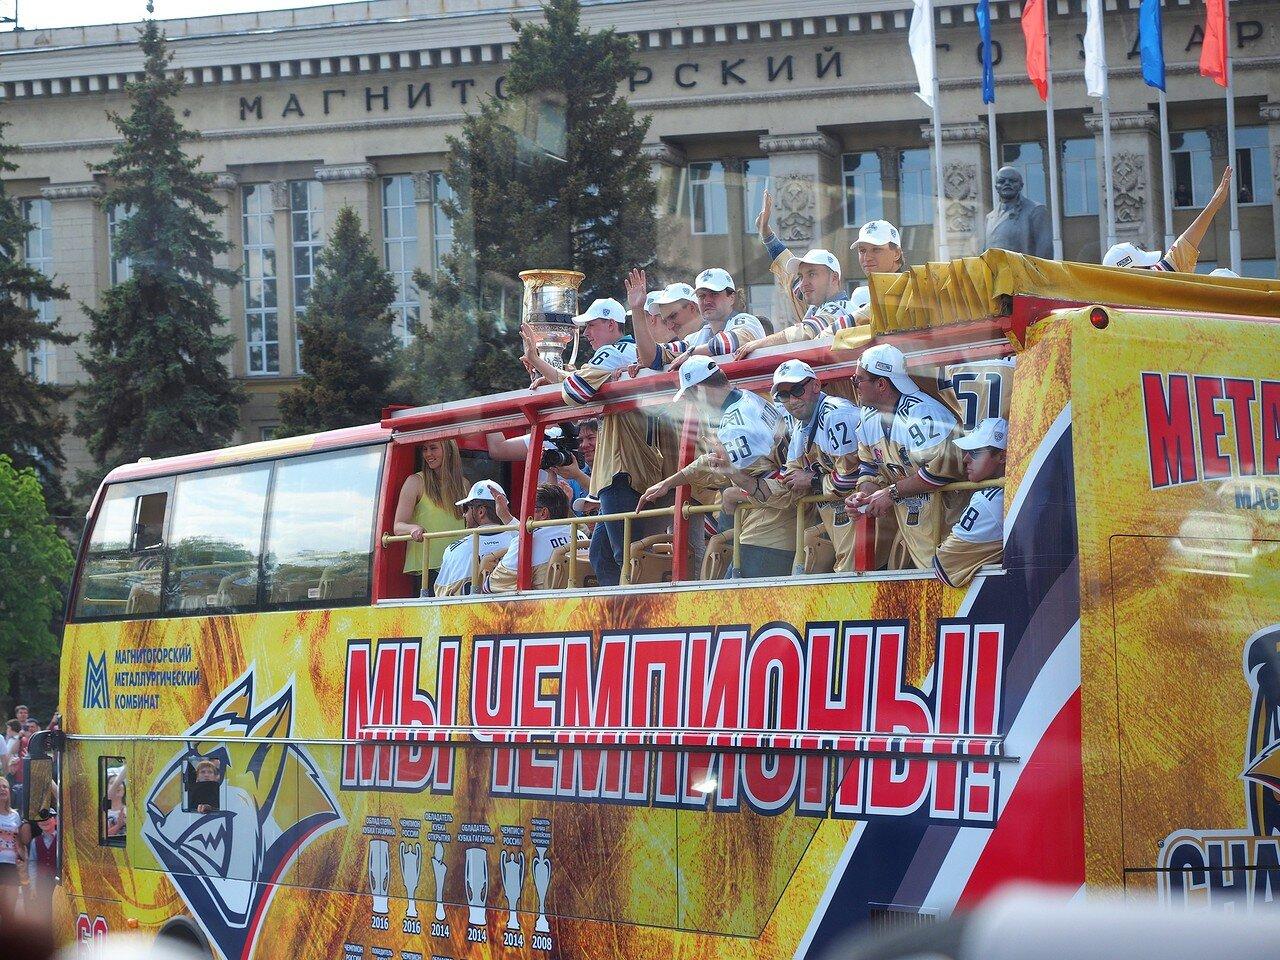 160Церемония чествования команды Металлург27.05.2016